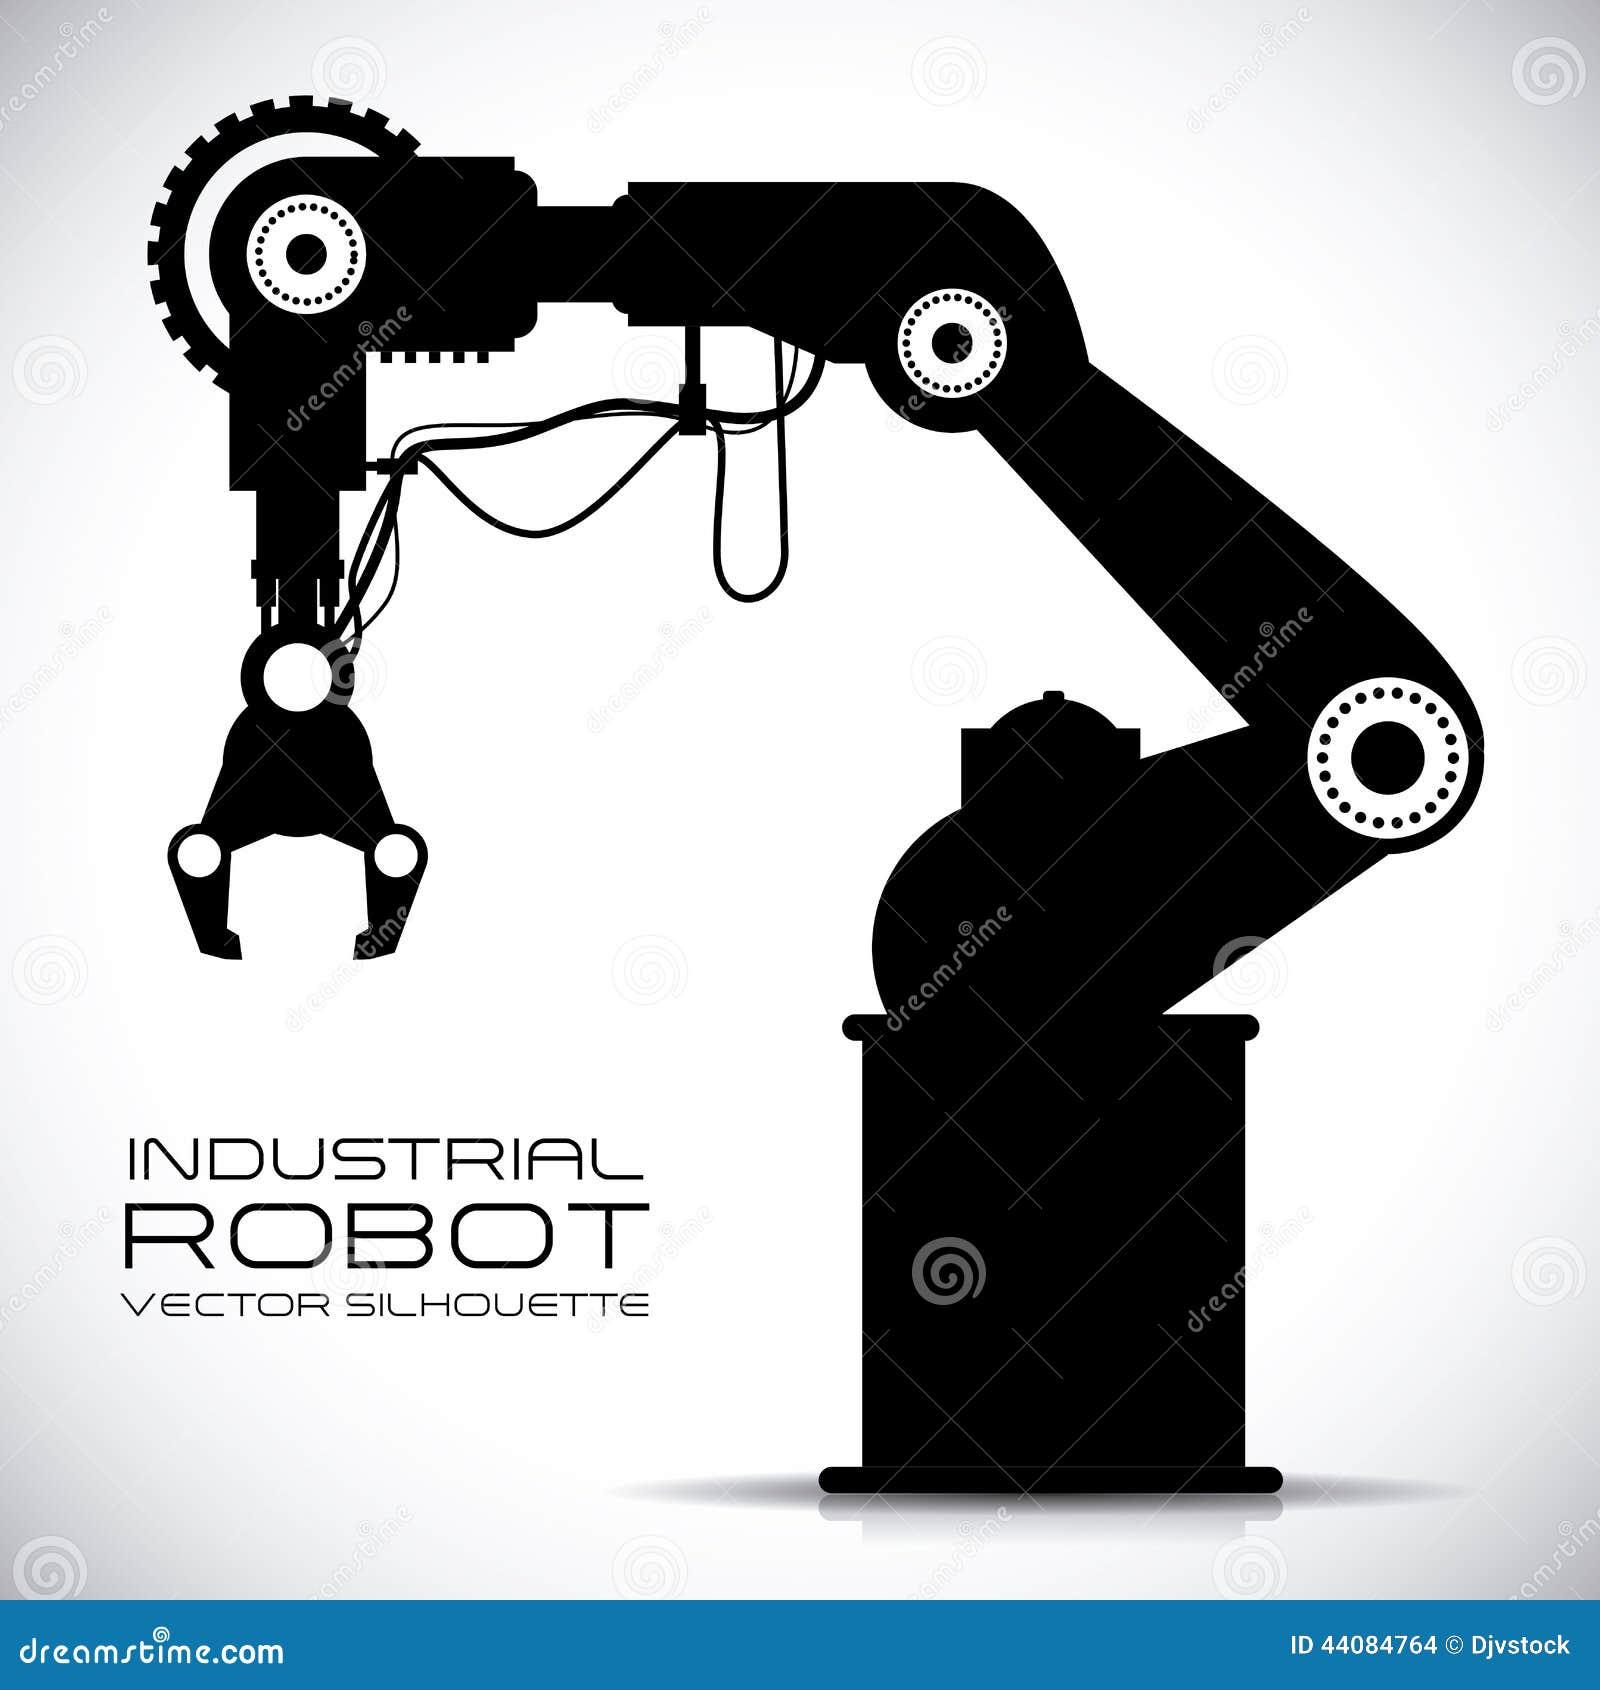 Robot Design Stock Vector Illustration Of Humanoid Icon 44084764